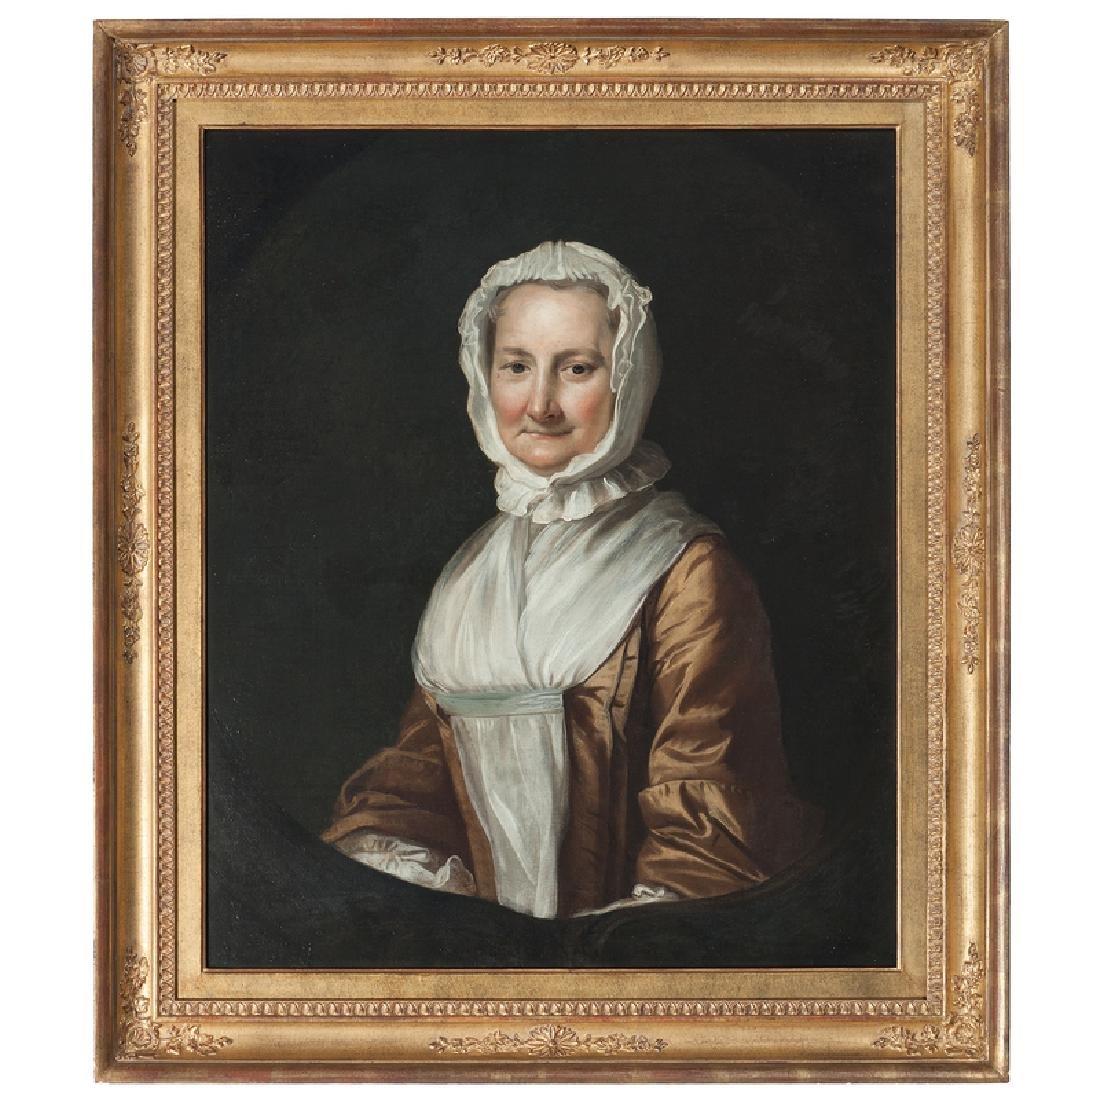 American Portrait of a Woman in a White Bonnet